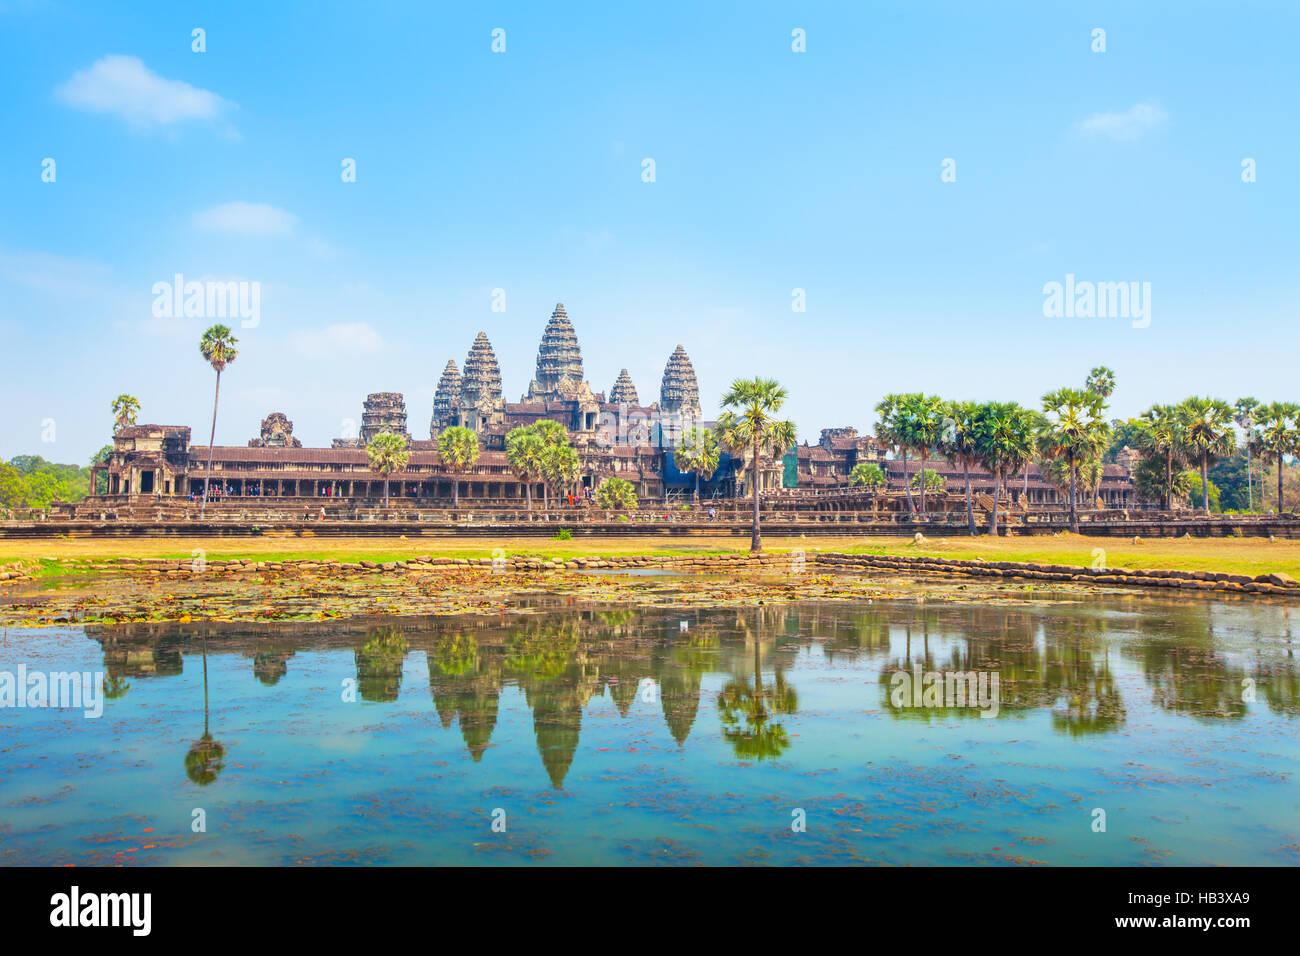 Angkor Wat Temple - Stock Image